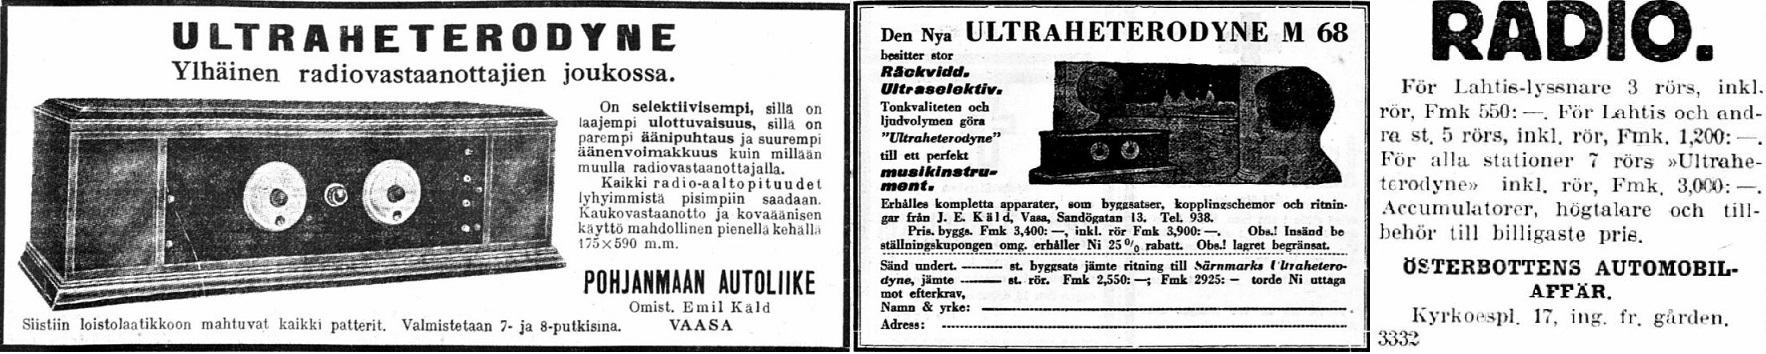 J__E__Kdld_Pohjanmaan_Autoliike_Uusi_Suomi_no_48_1928__J__E__Vasa_HBL_nr_340_1928__Vasabladet_nr_82_1928.jpg